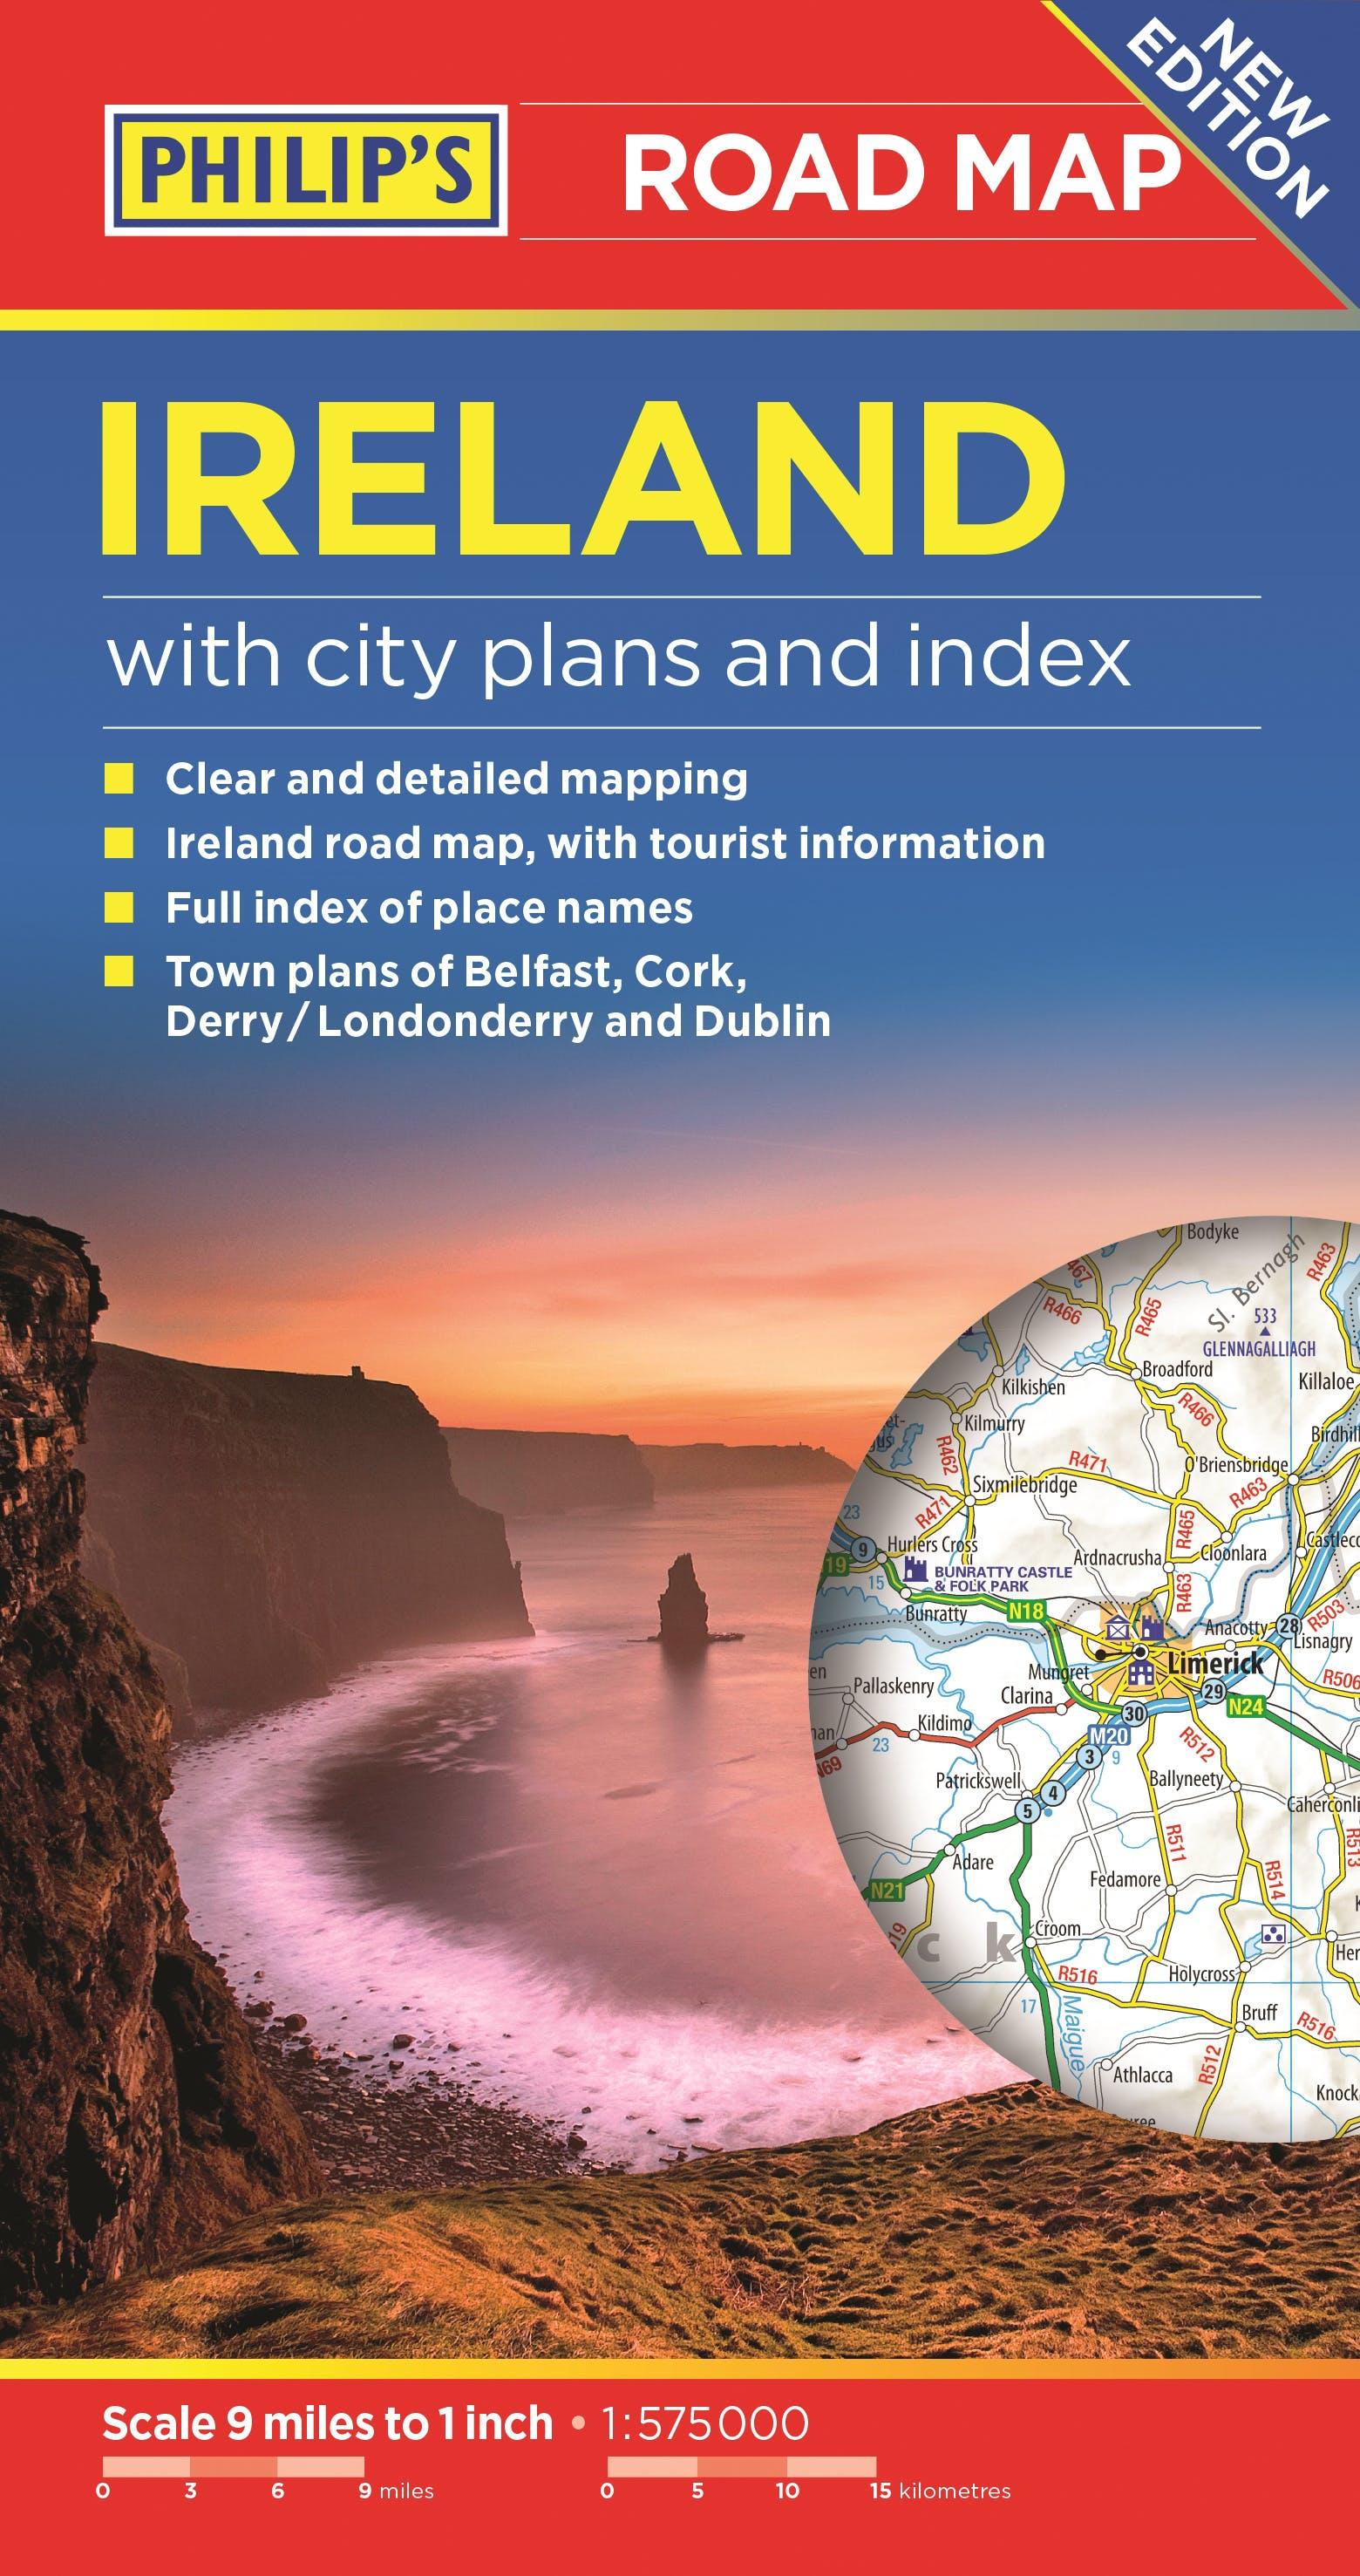 Map Of Ireland Headlands.Philip S Ireland Road Map By Philip S Maps Books Hachette Australia